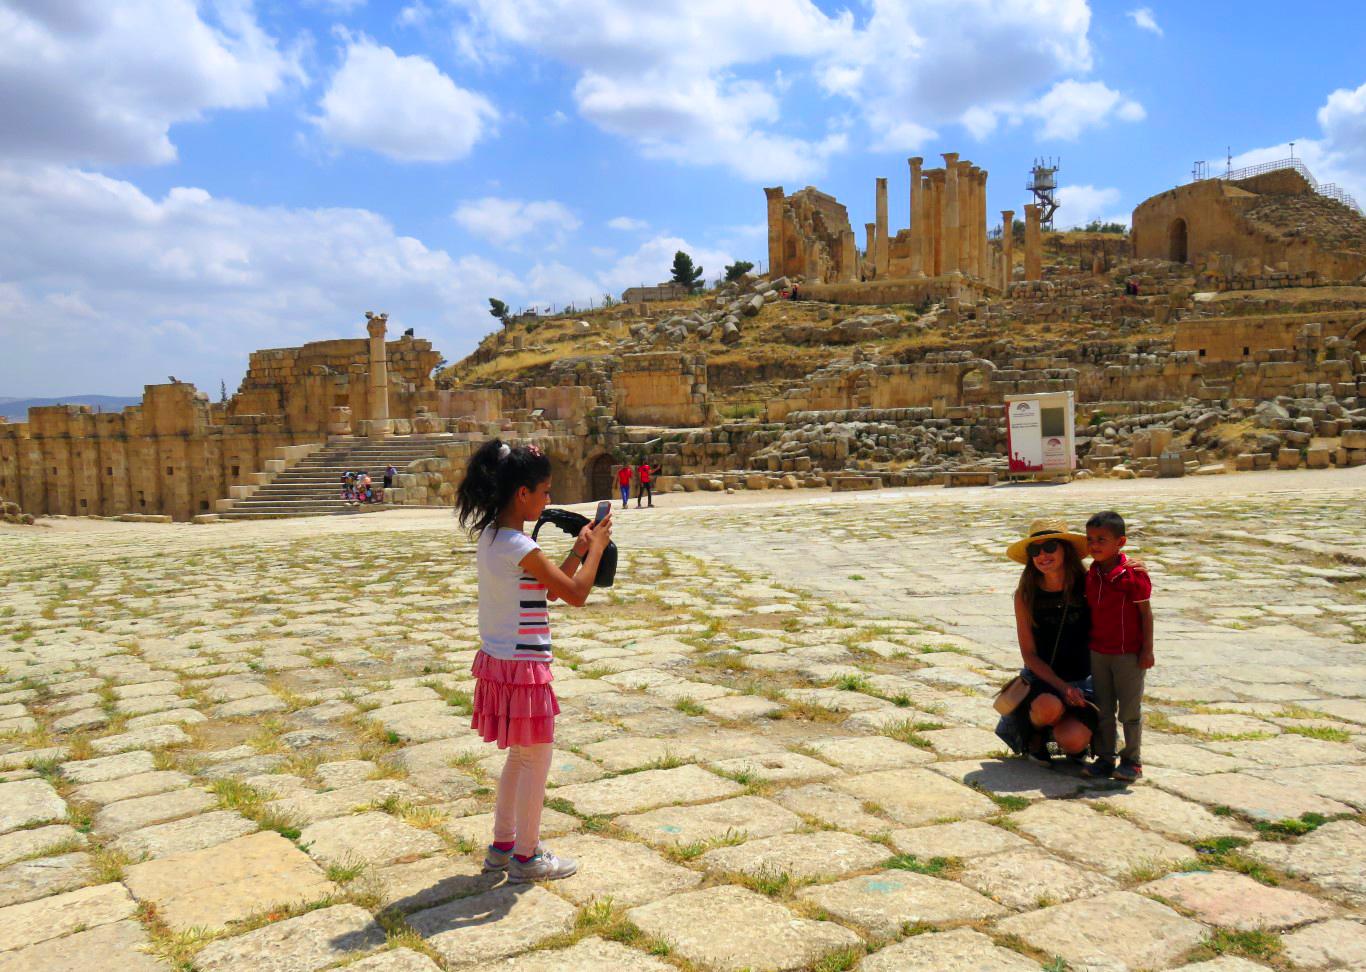 Viajar a Jordania - Ruta por Jordania en una semana - Viajes a Jordania jordania en una semana - 30469274942 2afd90c9af o - Ruta por Jordania en una semana